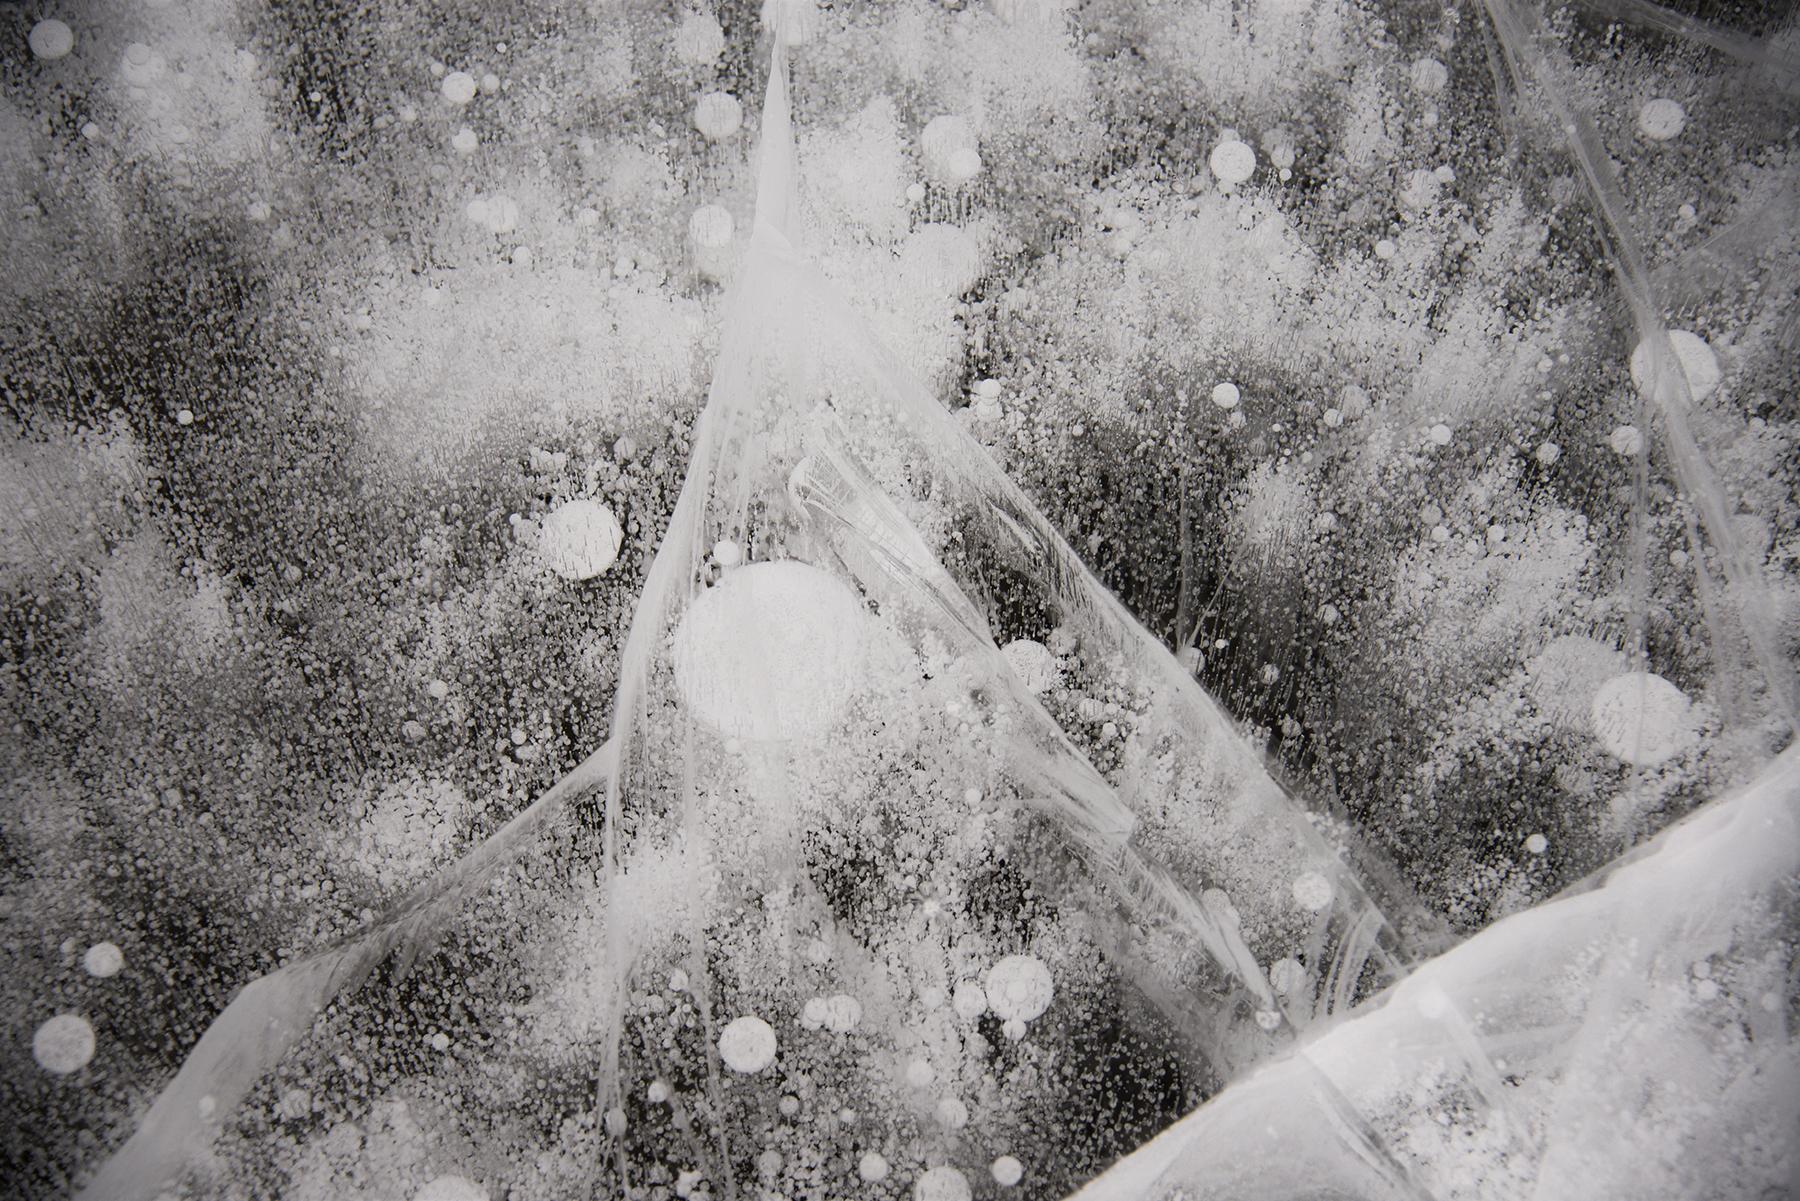 Cosmic Patterns I, Lake Hoare